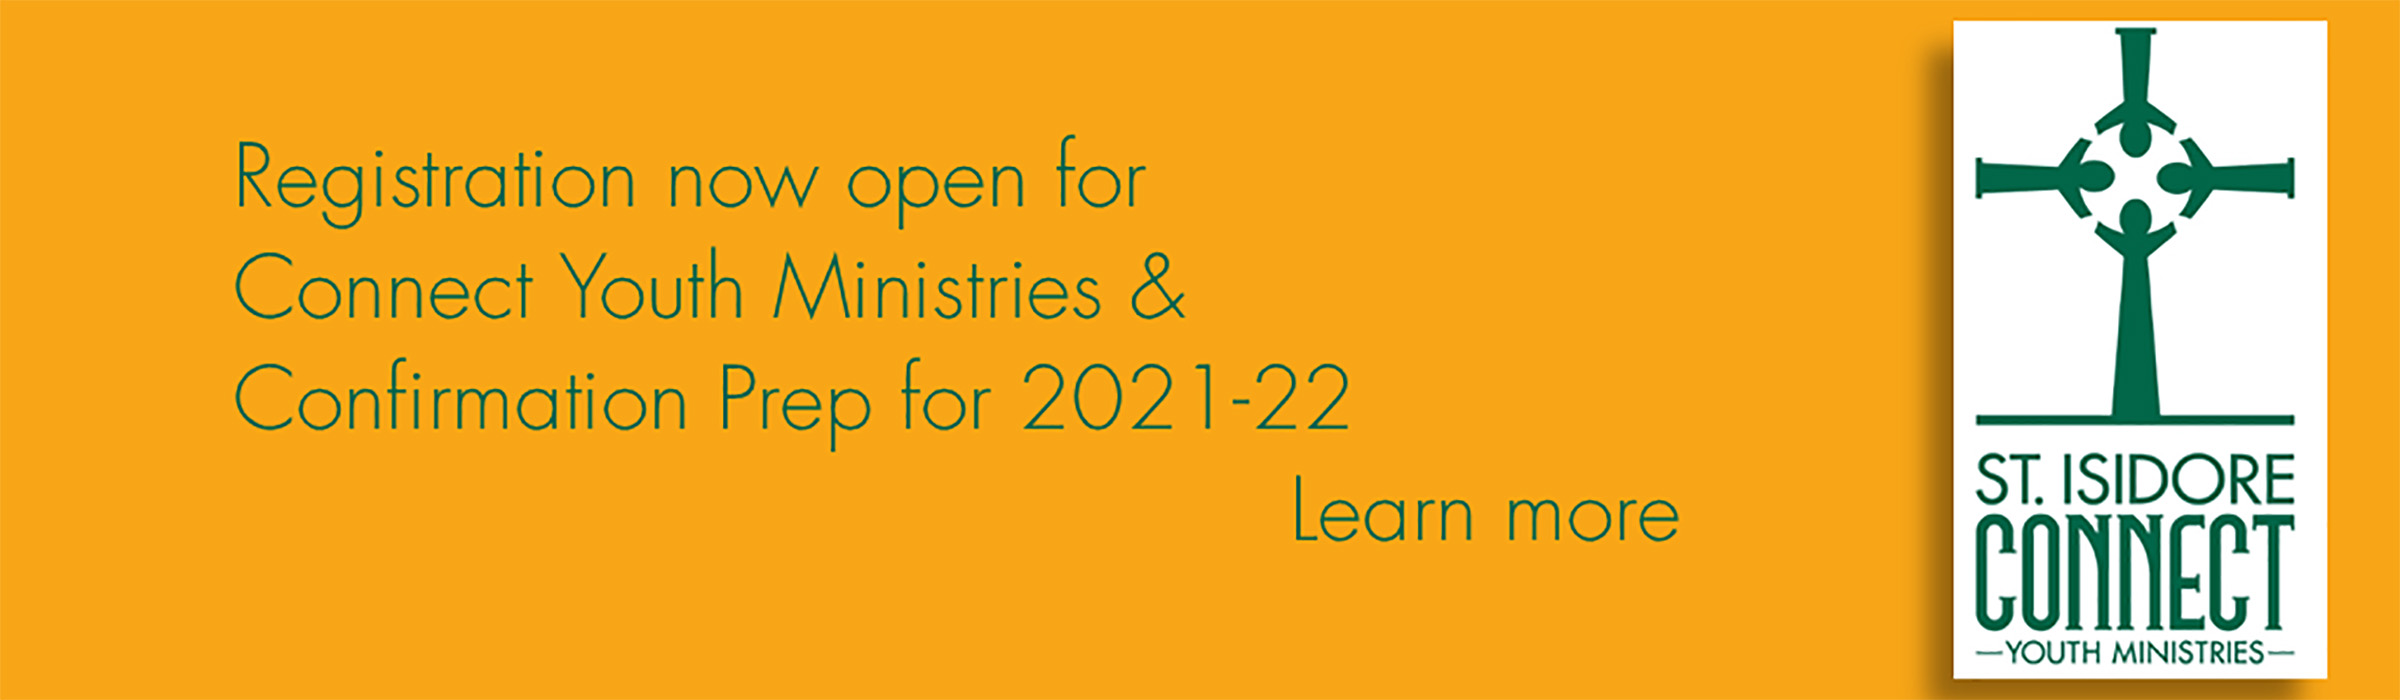 CYM and Conf prep registration 2021-22 slider